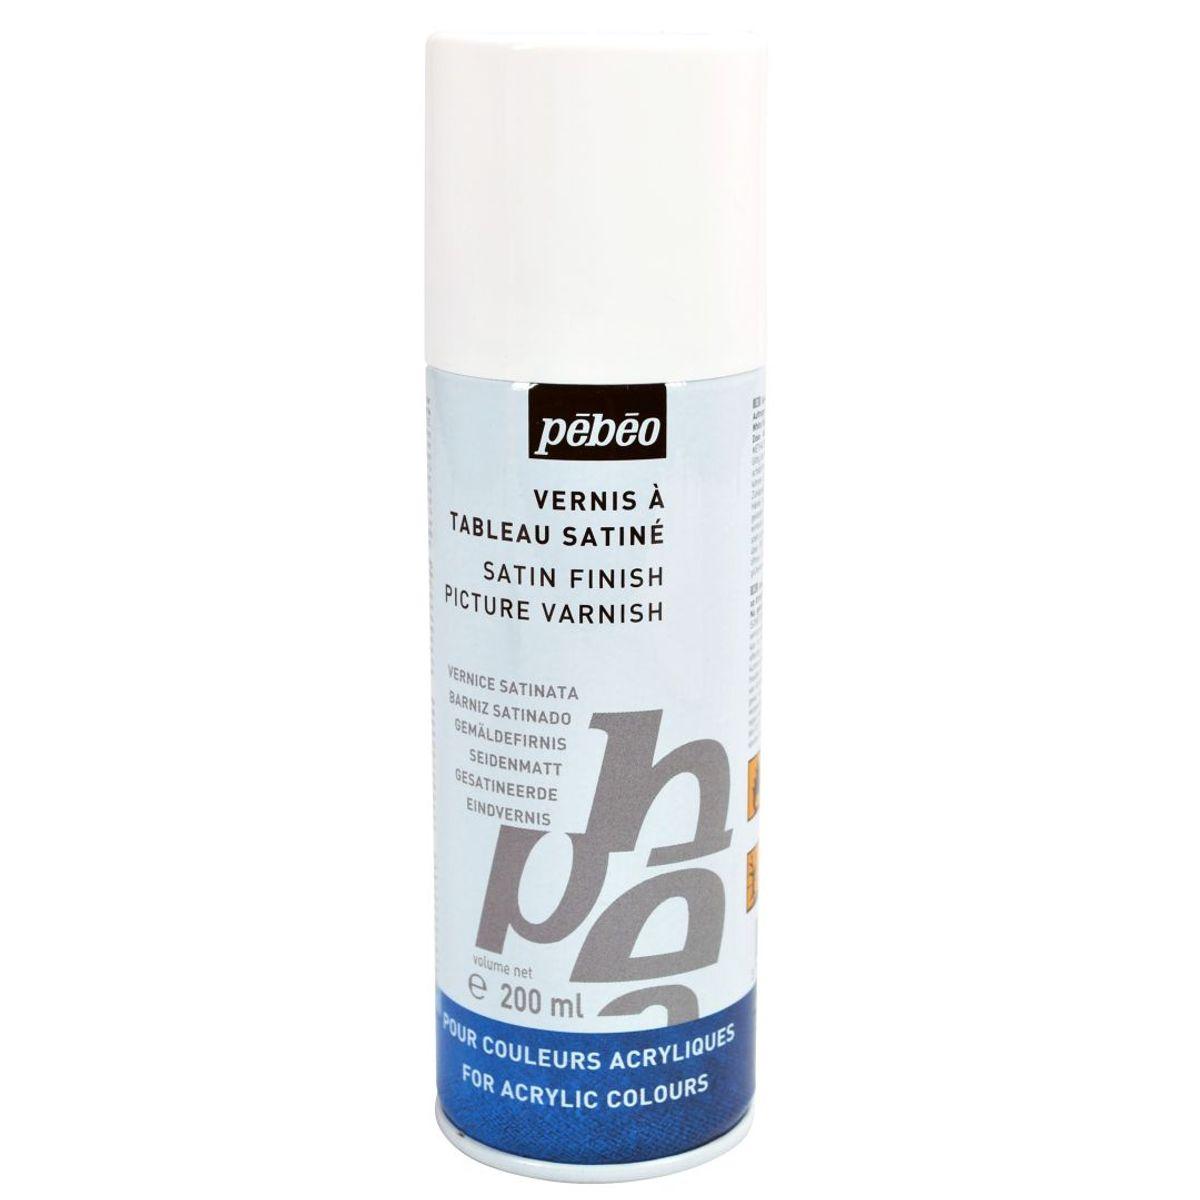 Spray Acrylic Painting To Protect